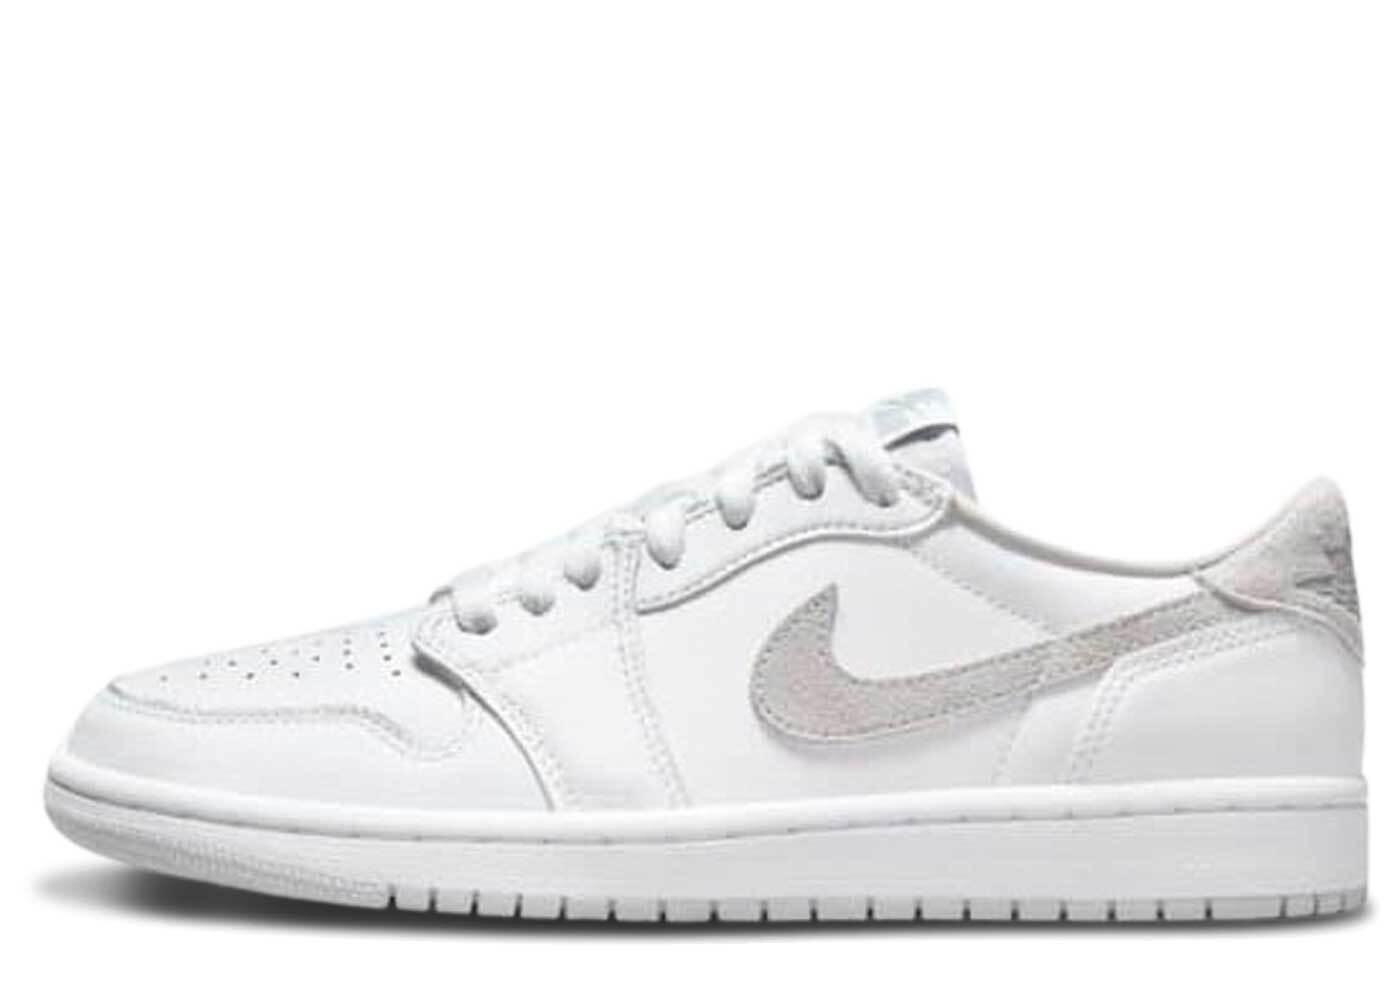 Nike Air Jordan 1 Low OG Neutral Grey Womensの写真